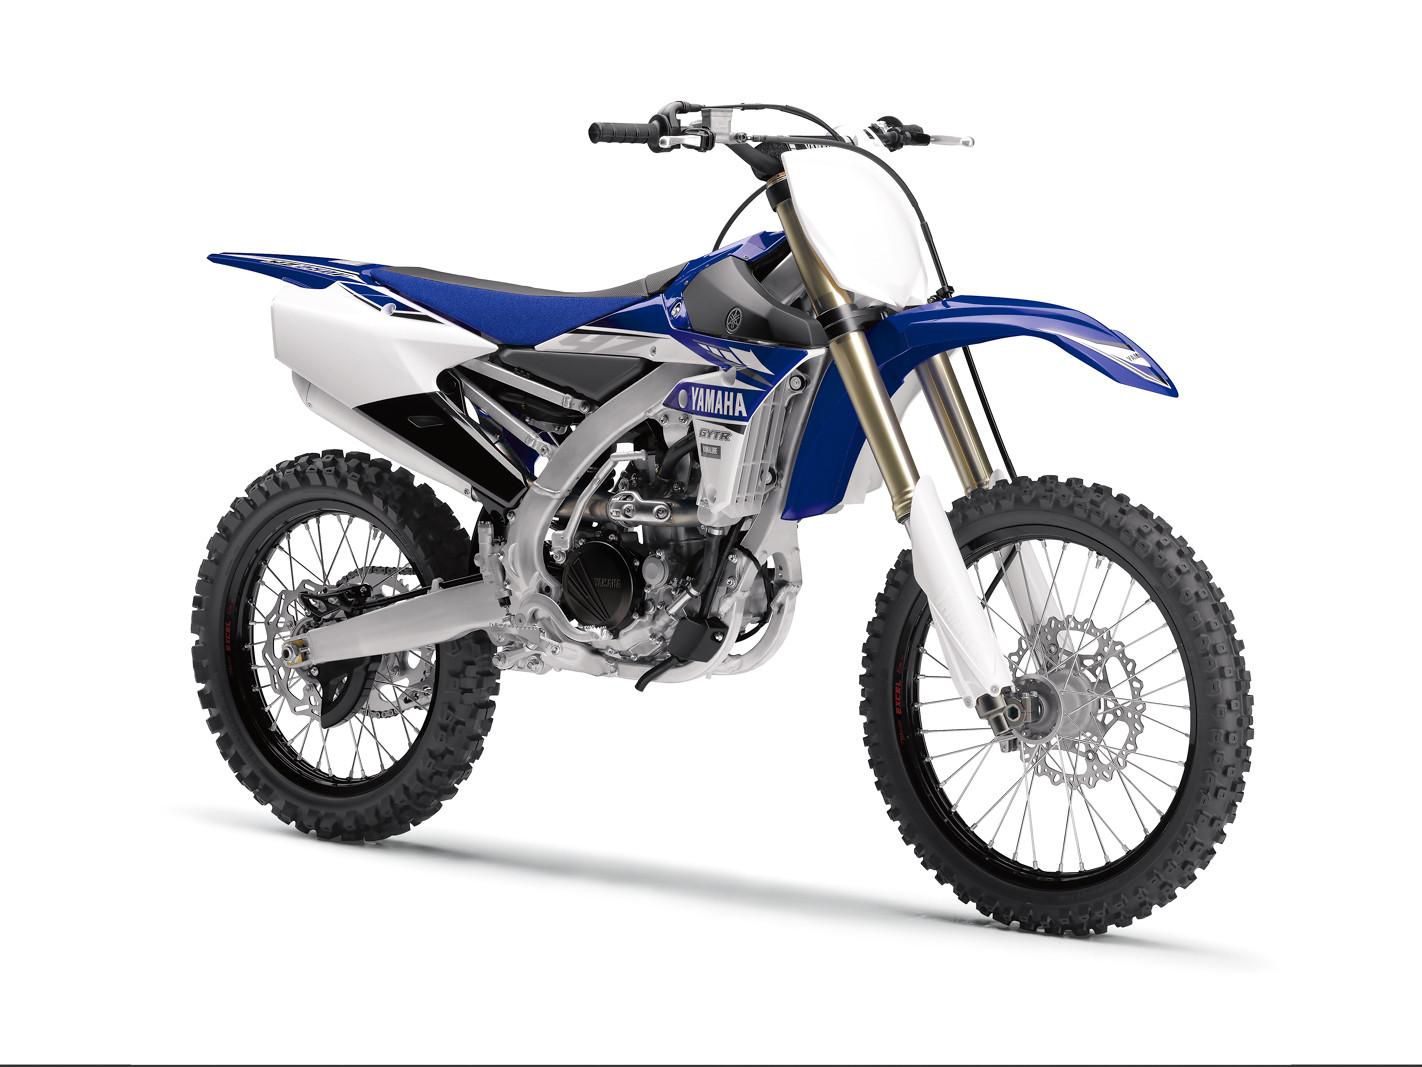 2017 Yamaha YZ250F - First Look: 2017 Yamaha Motocross and